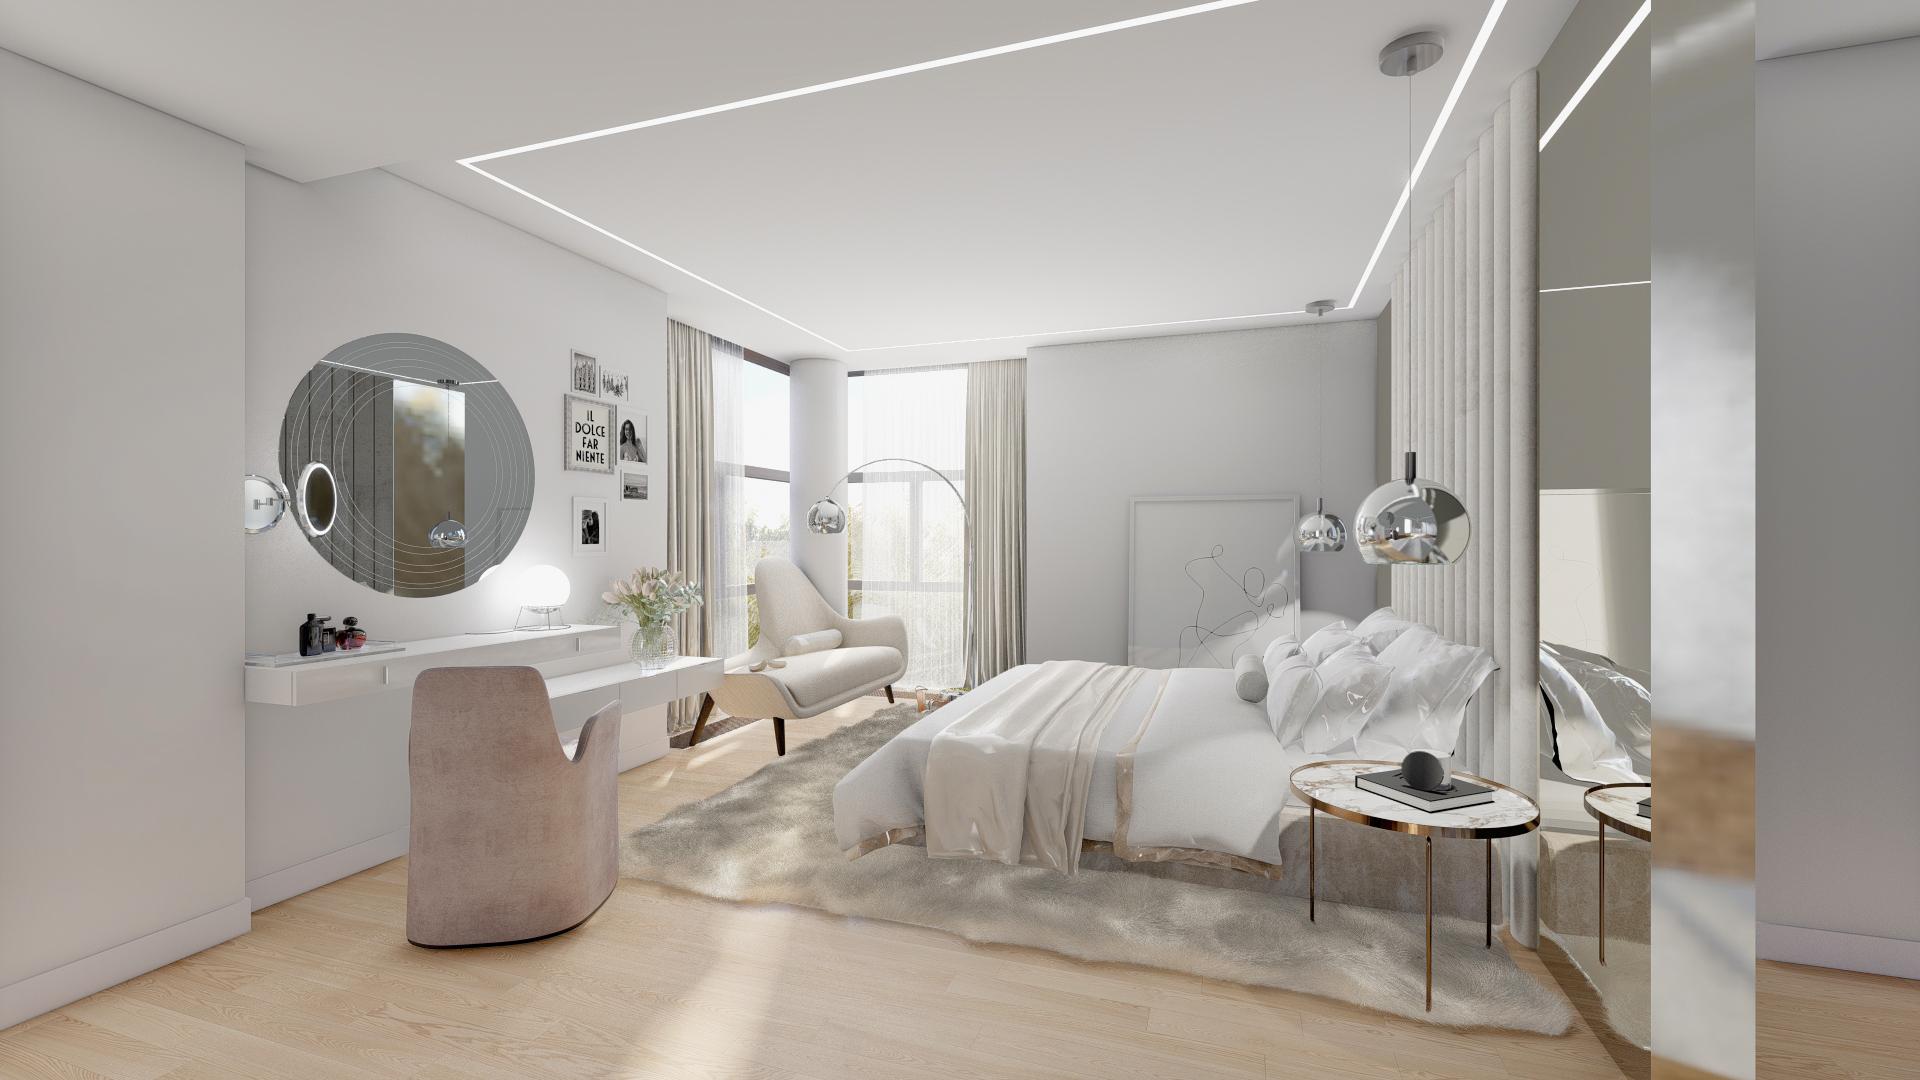 etaj-dormitor-master-v2_1—Photo